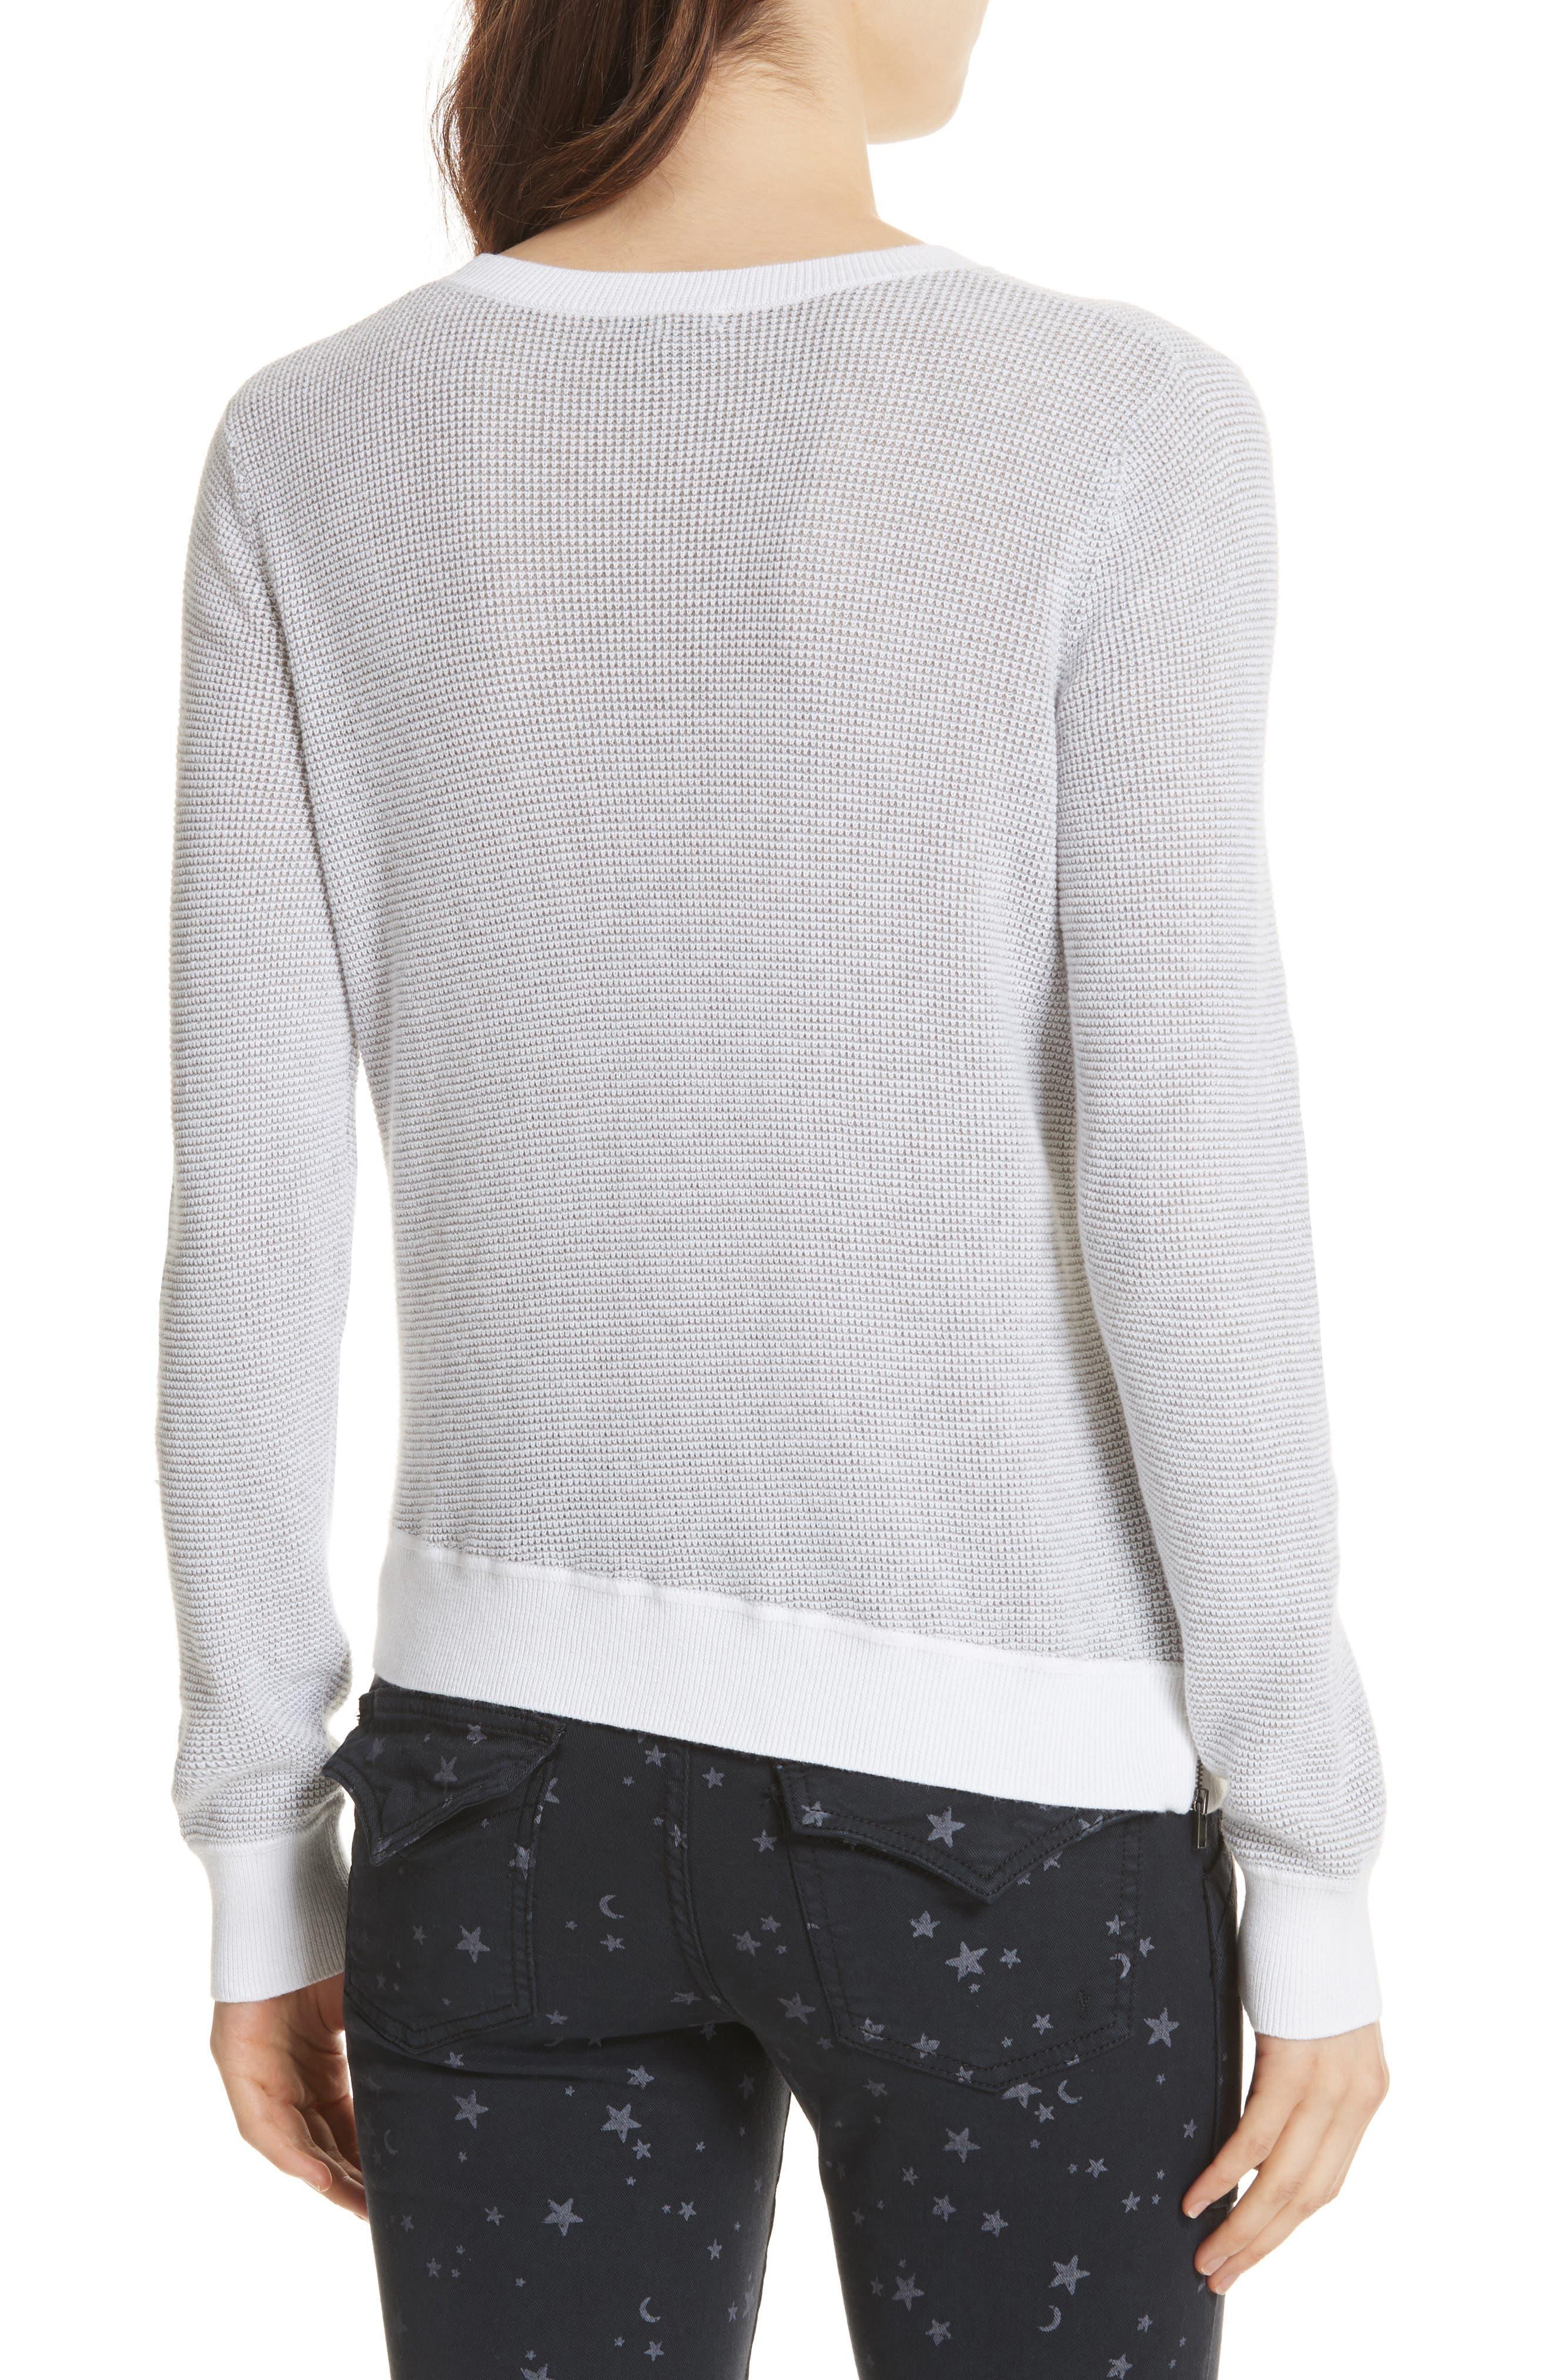 Laurana Cotton & Cashmere Sweater,                             Alternate thumbnail 2, color,